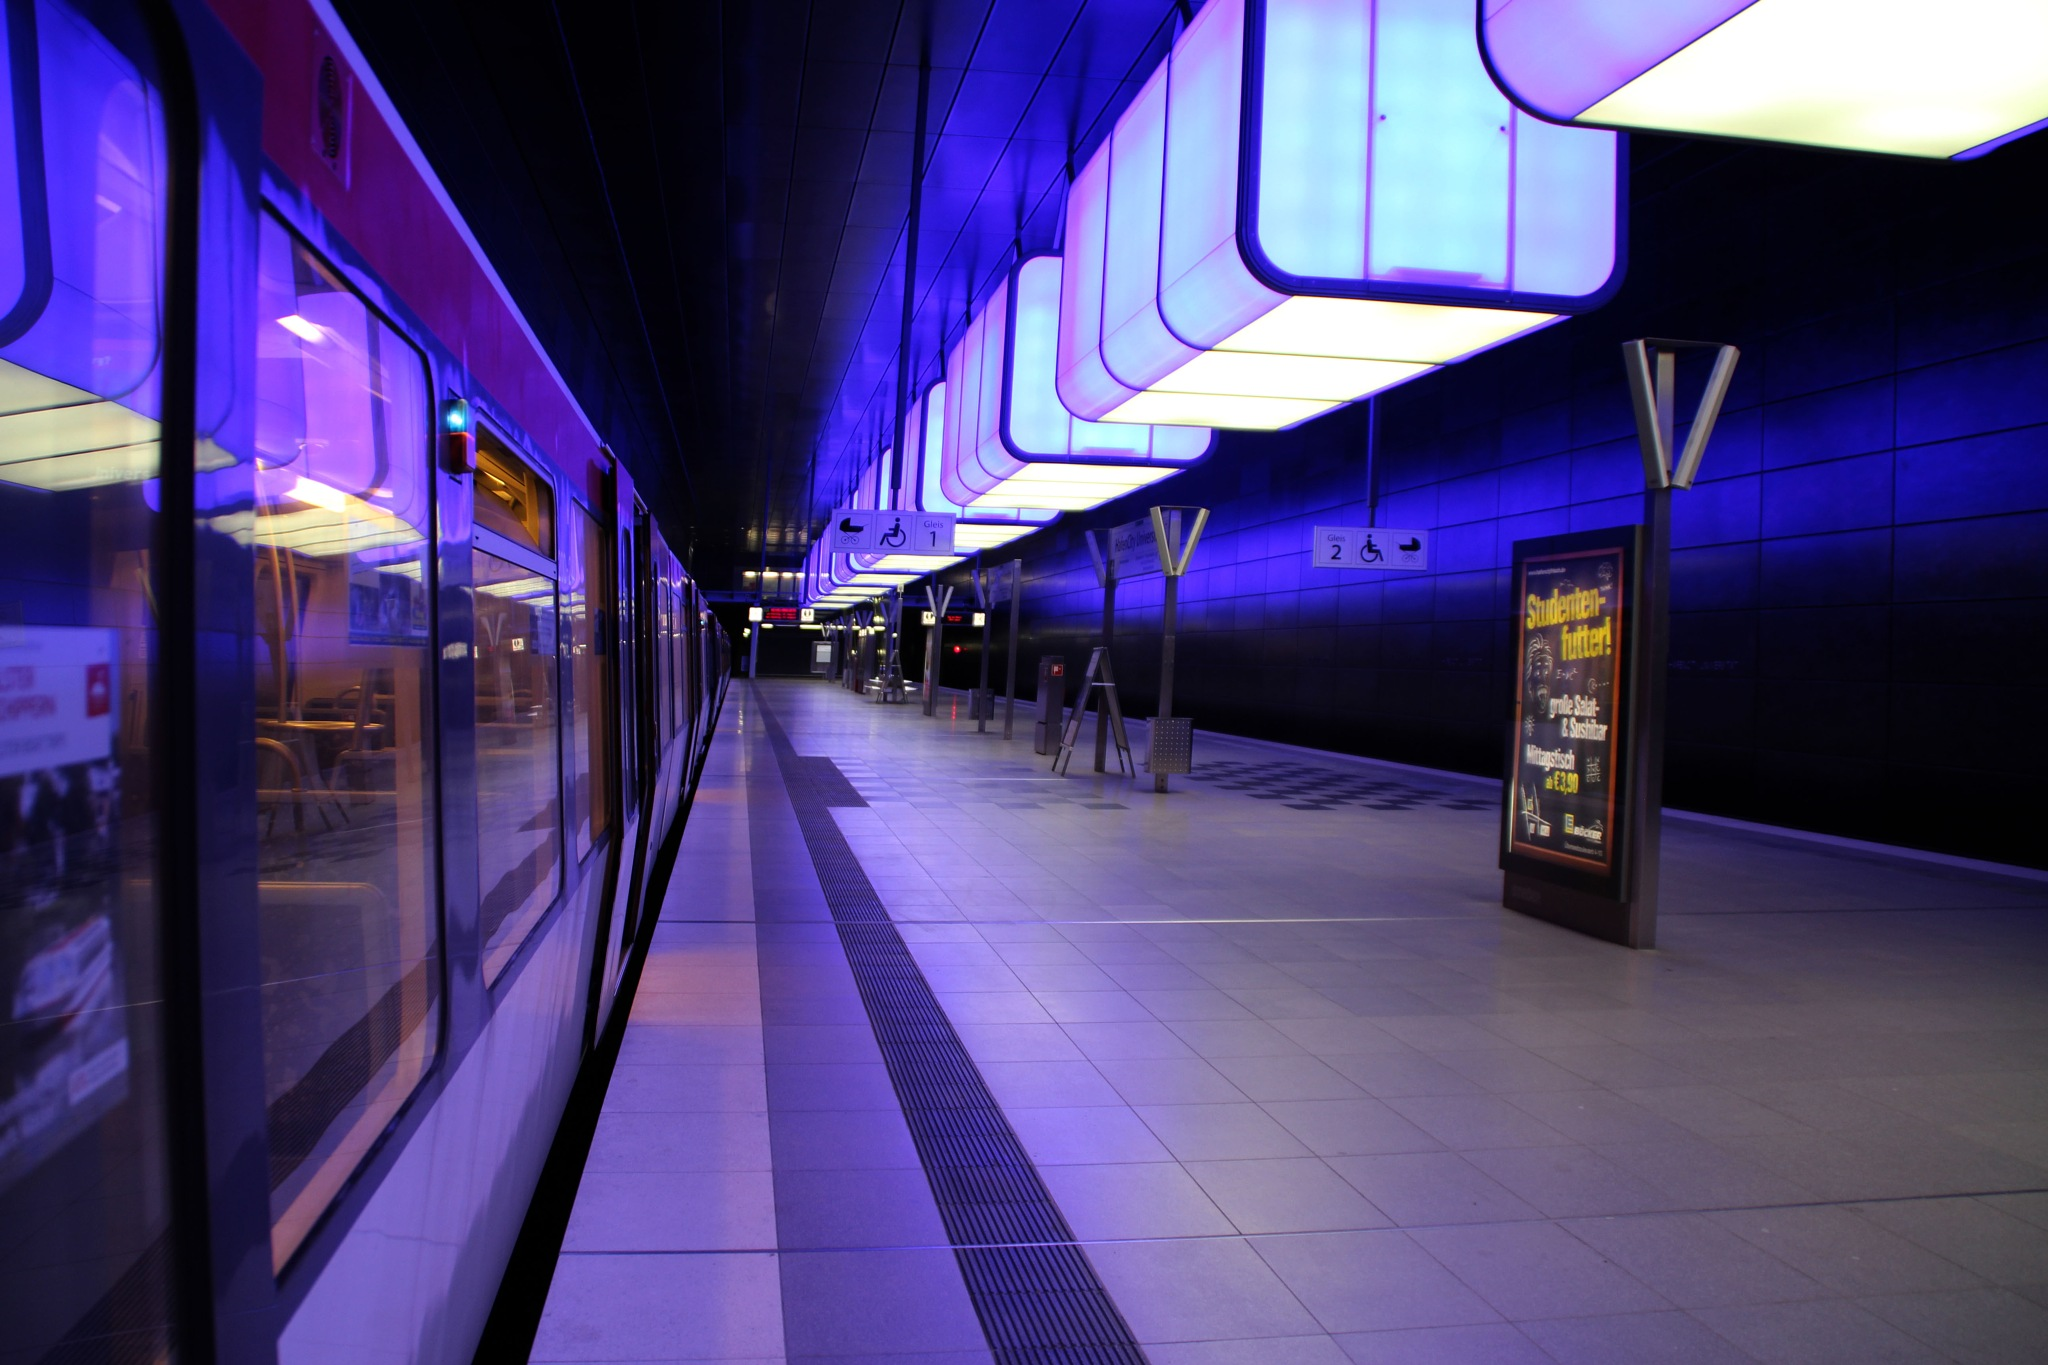 HafenCity metro station - Hamburg by inge.kanakarisW